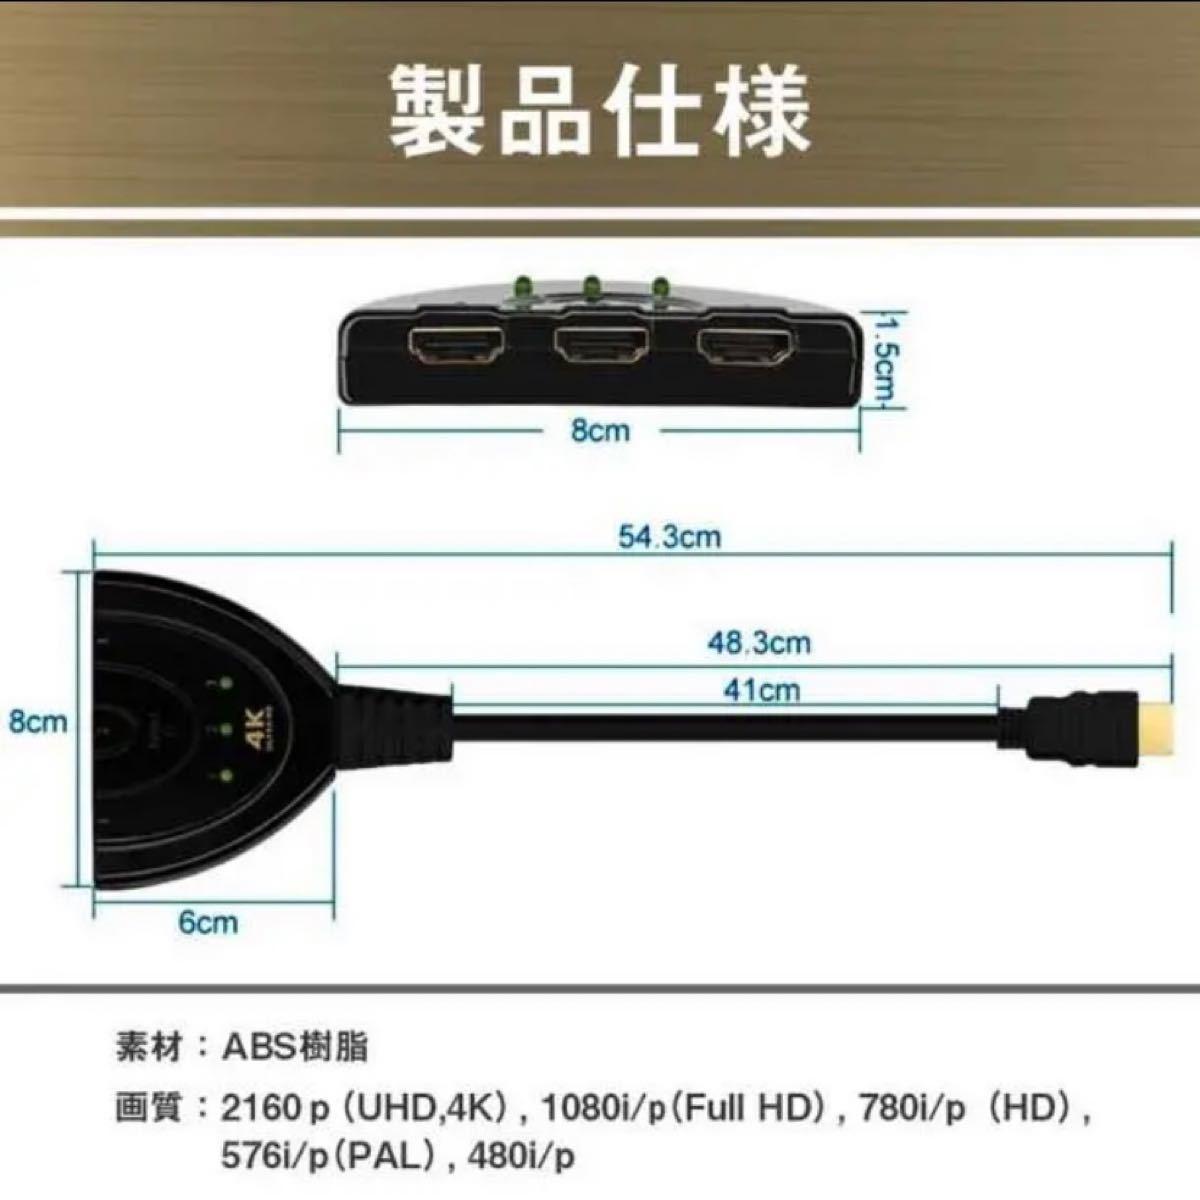 1.5m HDMI セレクター 切替器 分配器 3入力1出力 ゲーム ケーブル